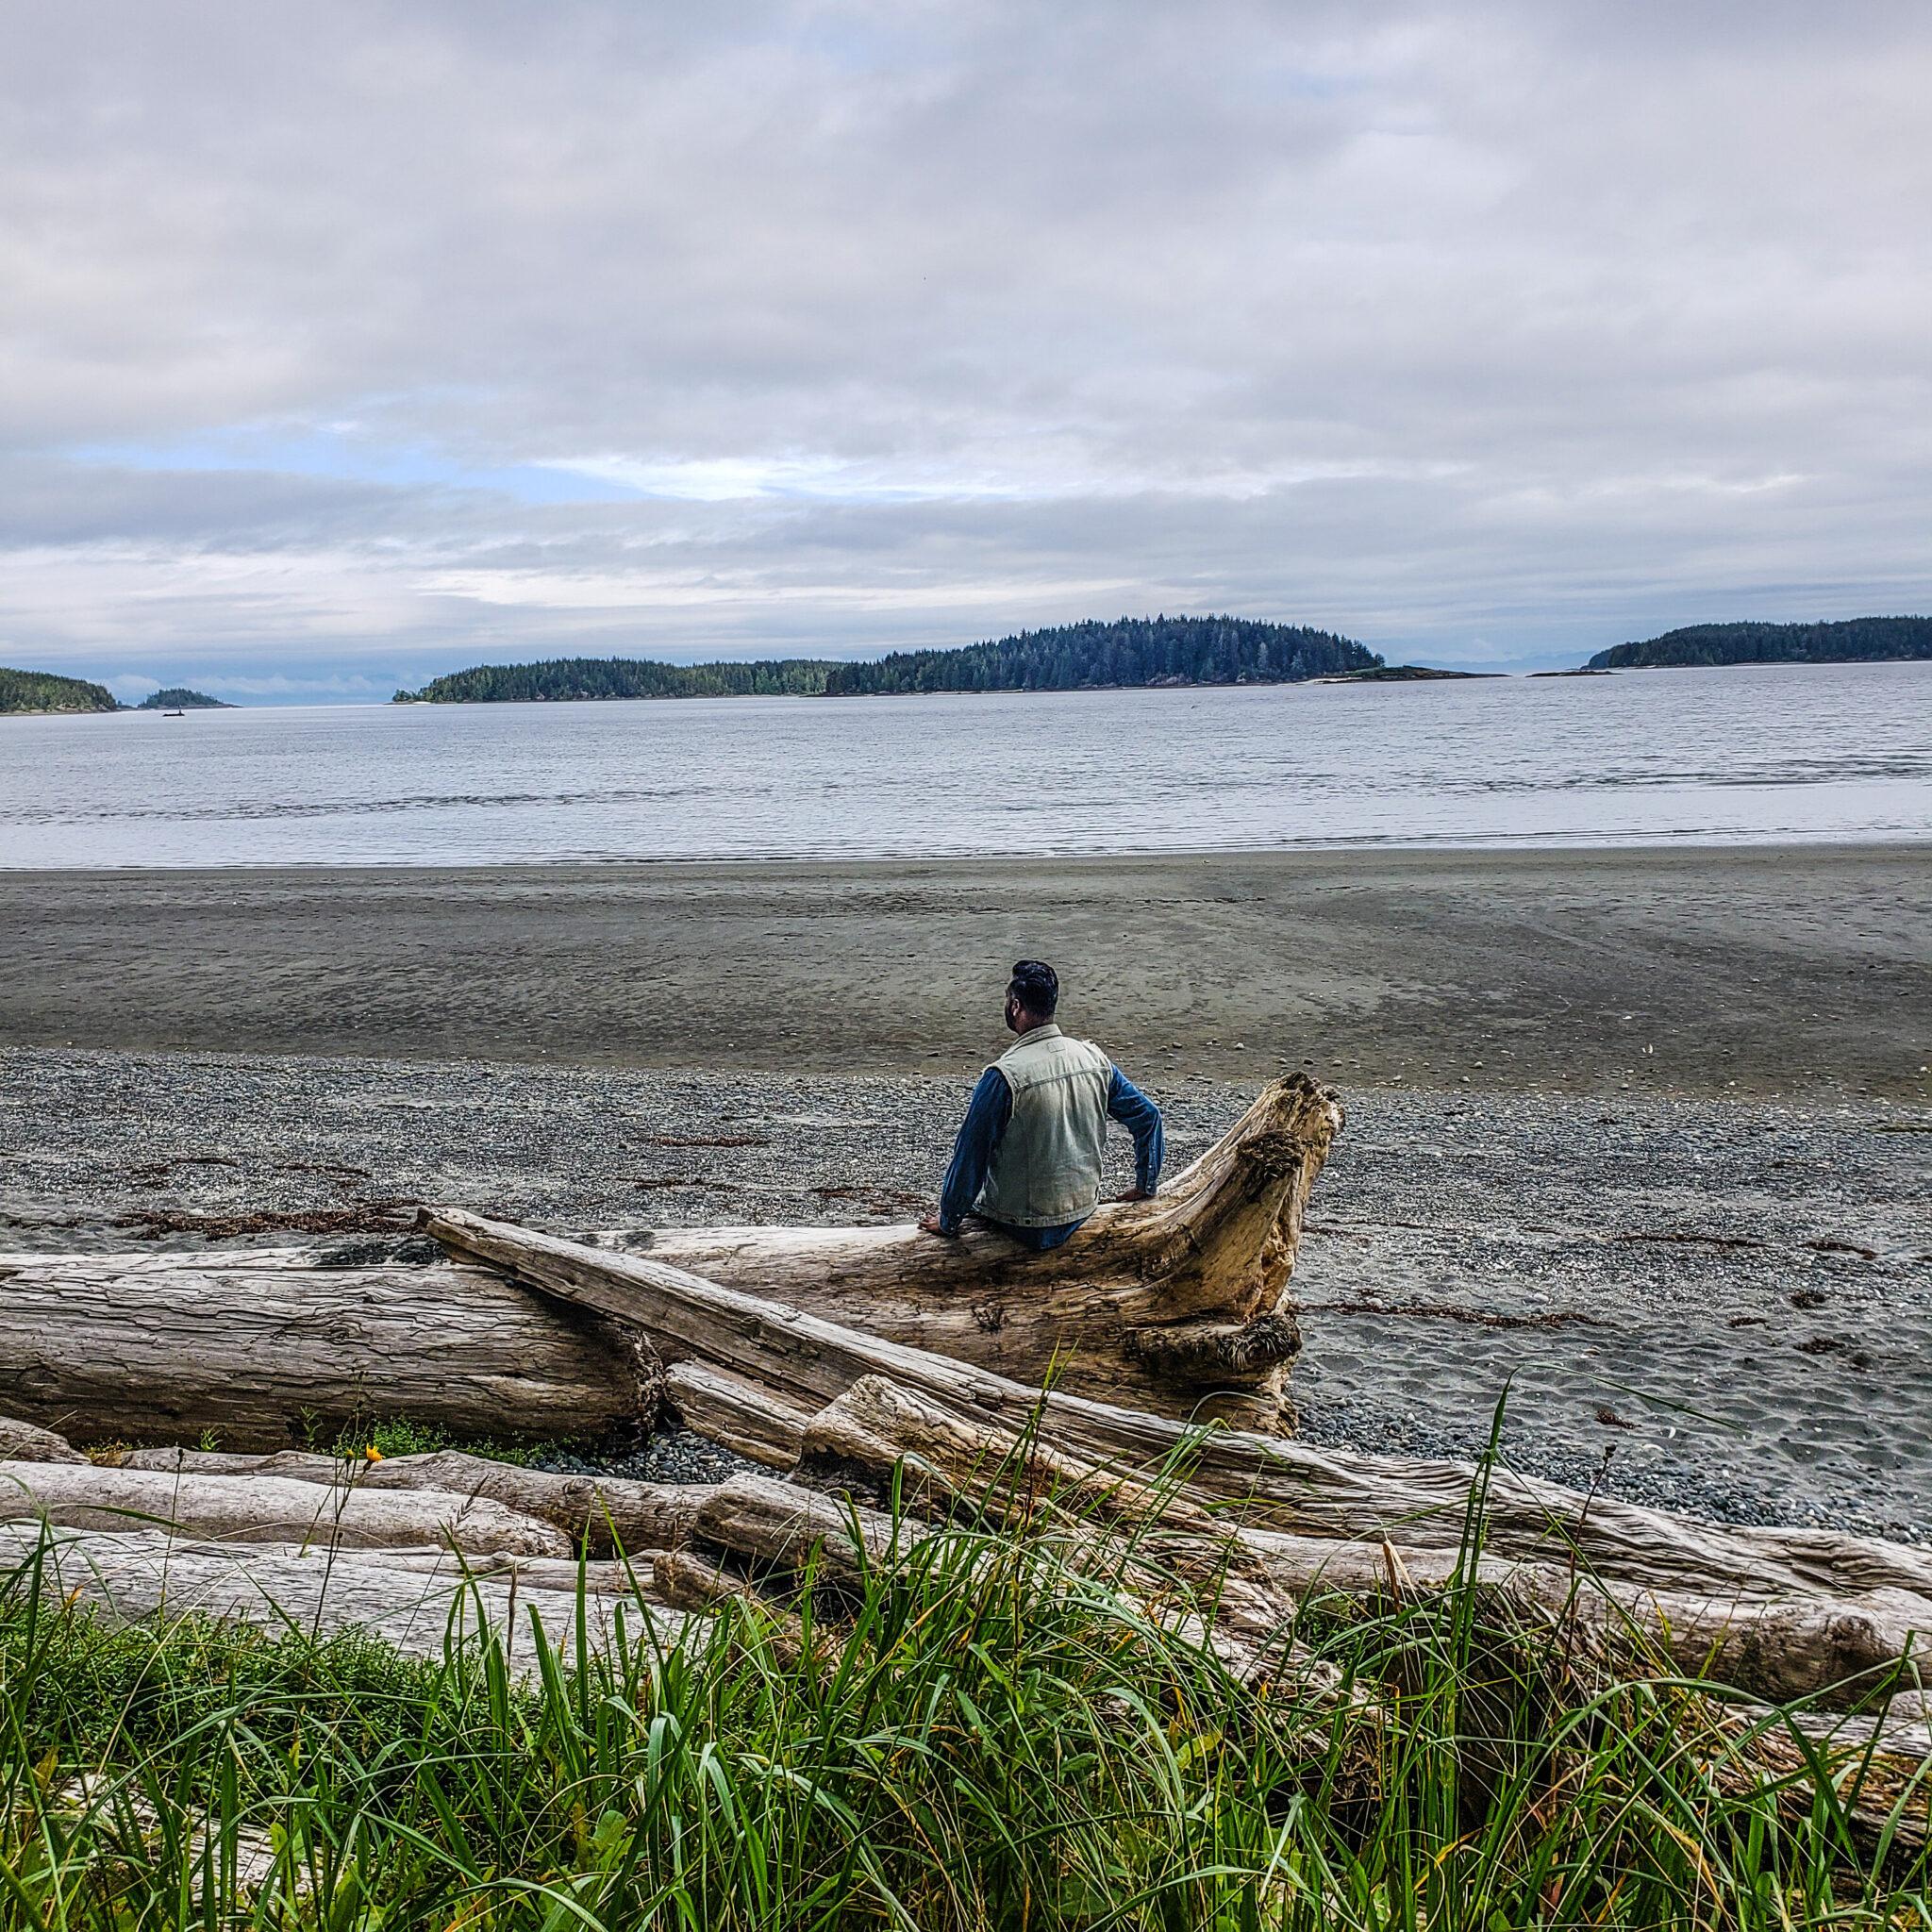 Visit Port Hardy - Vancouver Island North - Explore Canada - Hello British Columbia - Storey's Beach - Driftwood